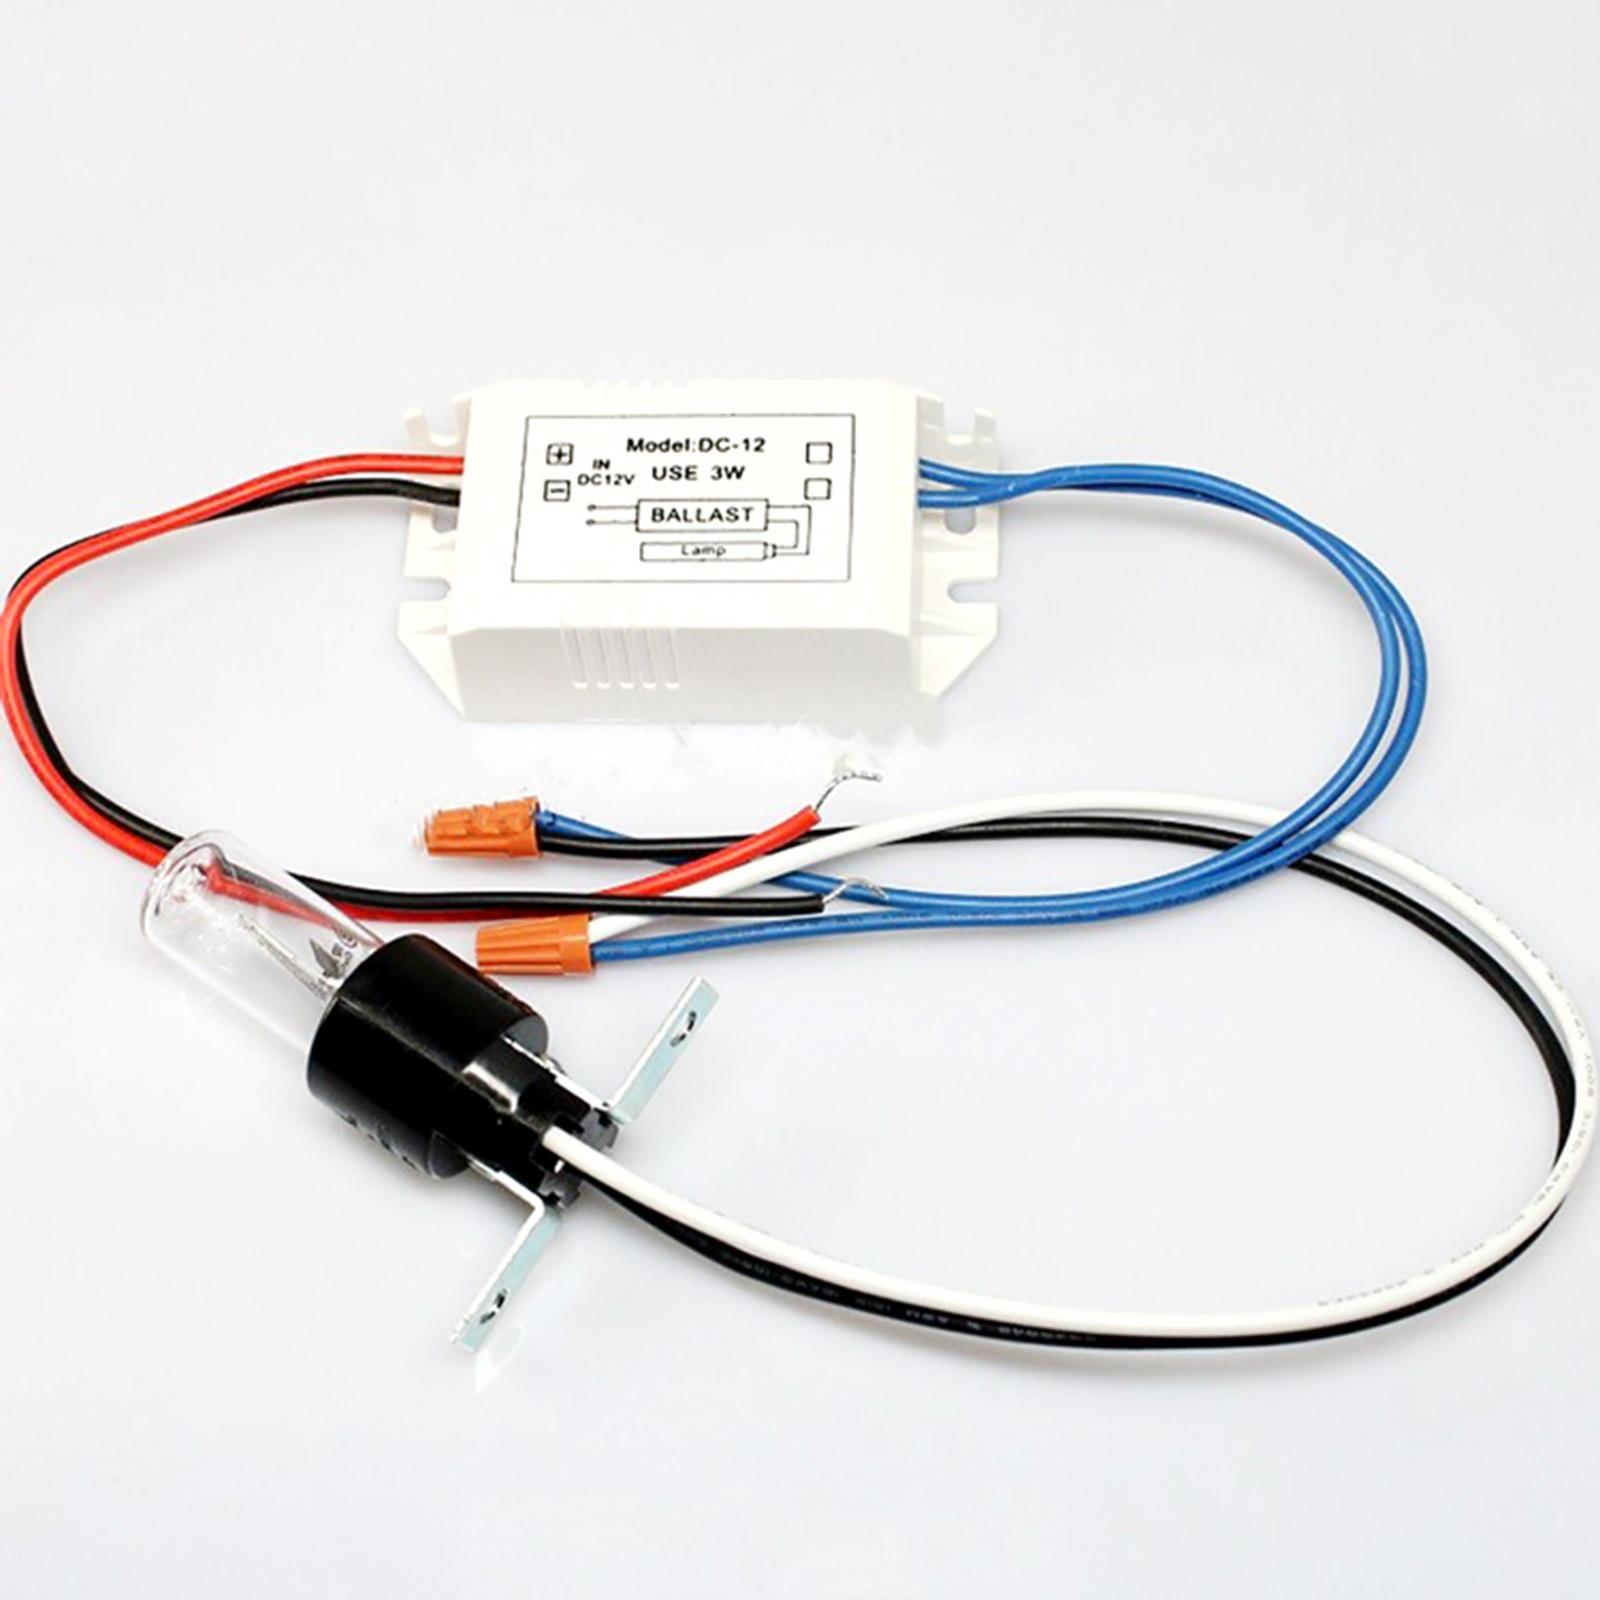 CNLIGHT Capacitor UV Bulb Sterilizing Lamp UVC 254nm 10V 3W AC/DC 110V/220V 12V Set|Replacement Parts & Accessories| |  - title=